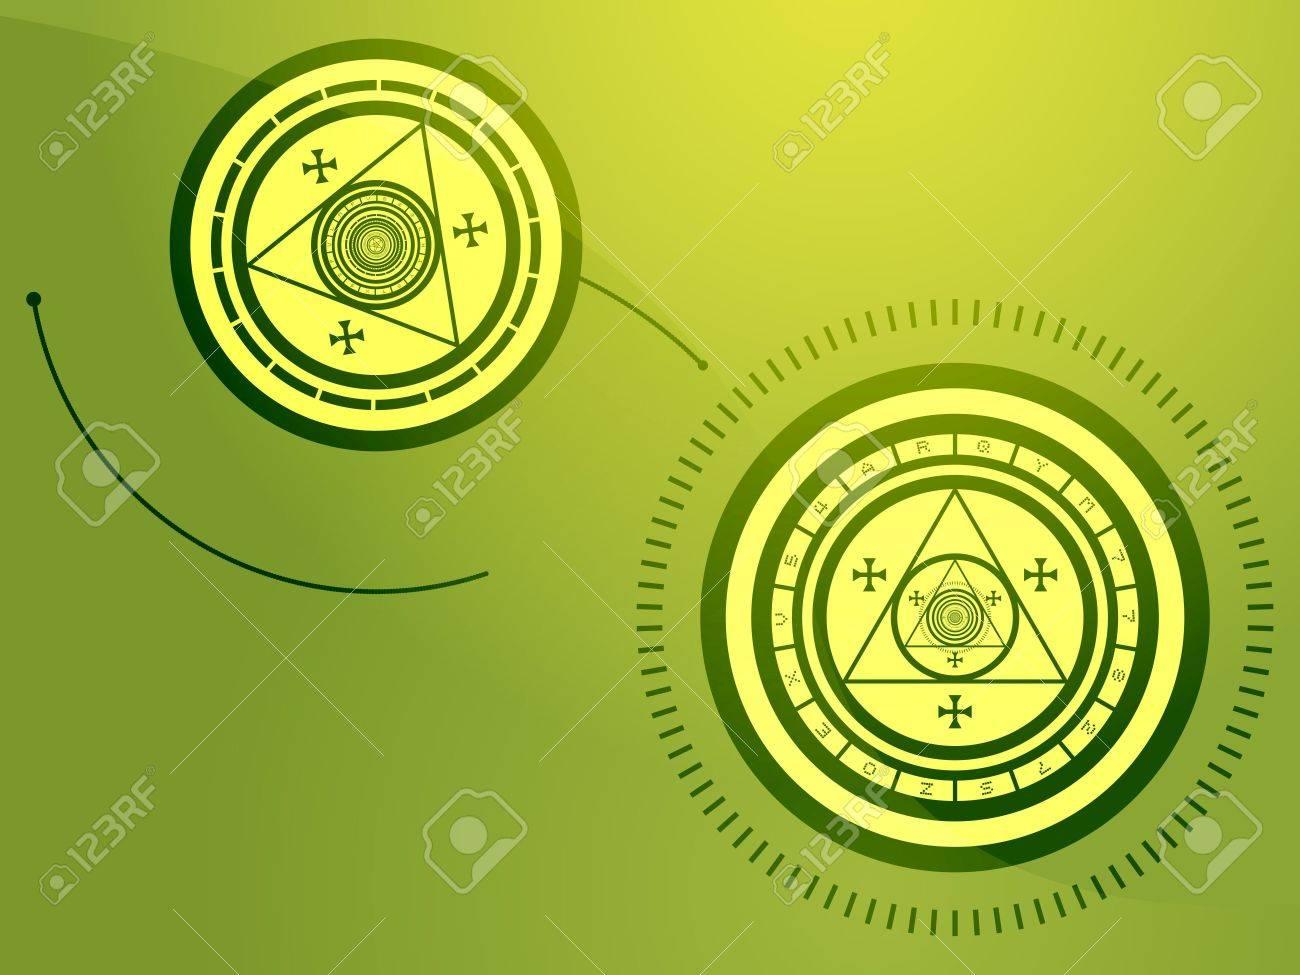 Wierd arcane symbols that look strange and occult Stock Photo - 3464453